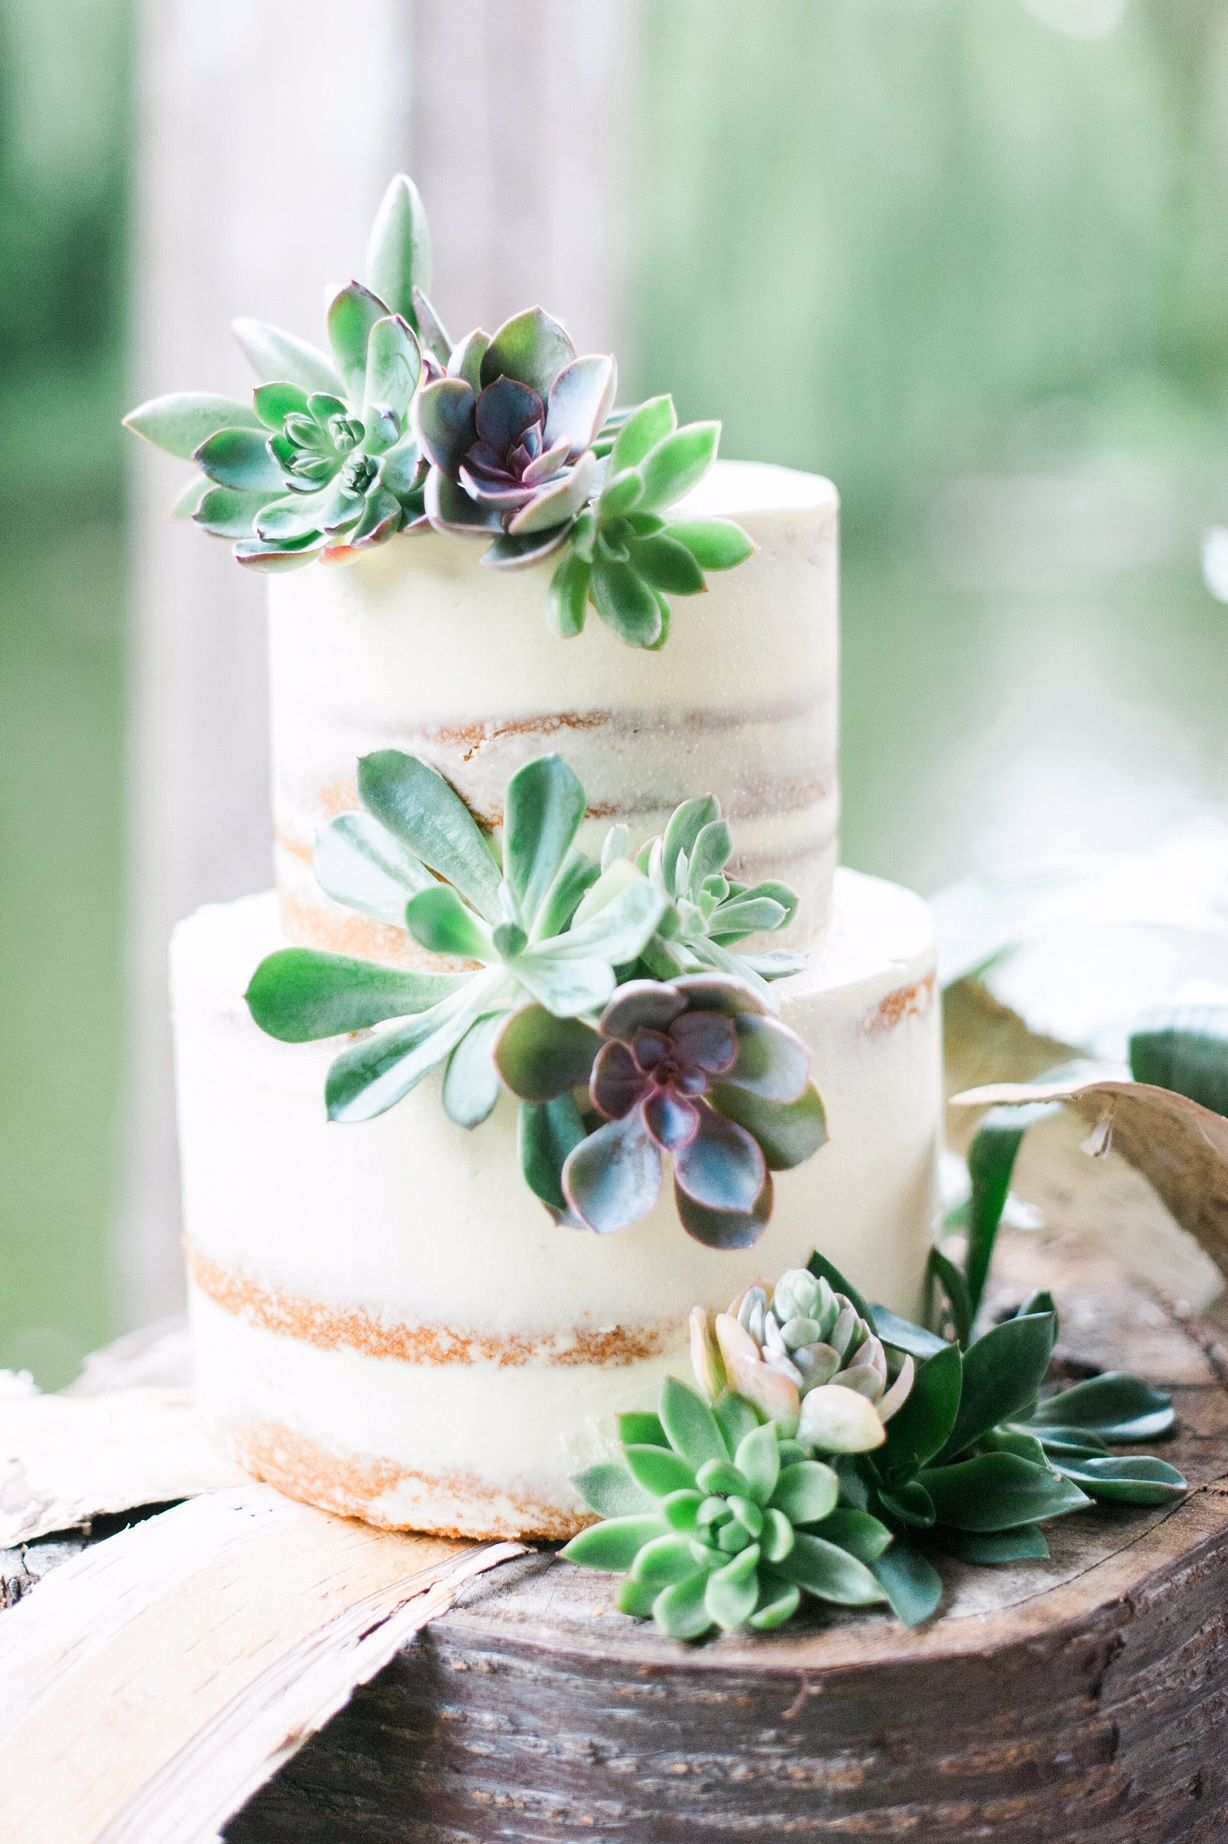 Unique Cakes by Yevnig Cake - Unique Cakes by Yevnig